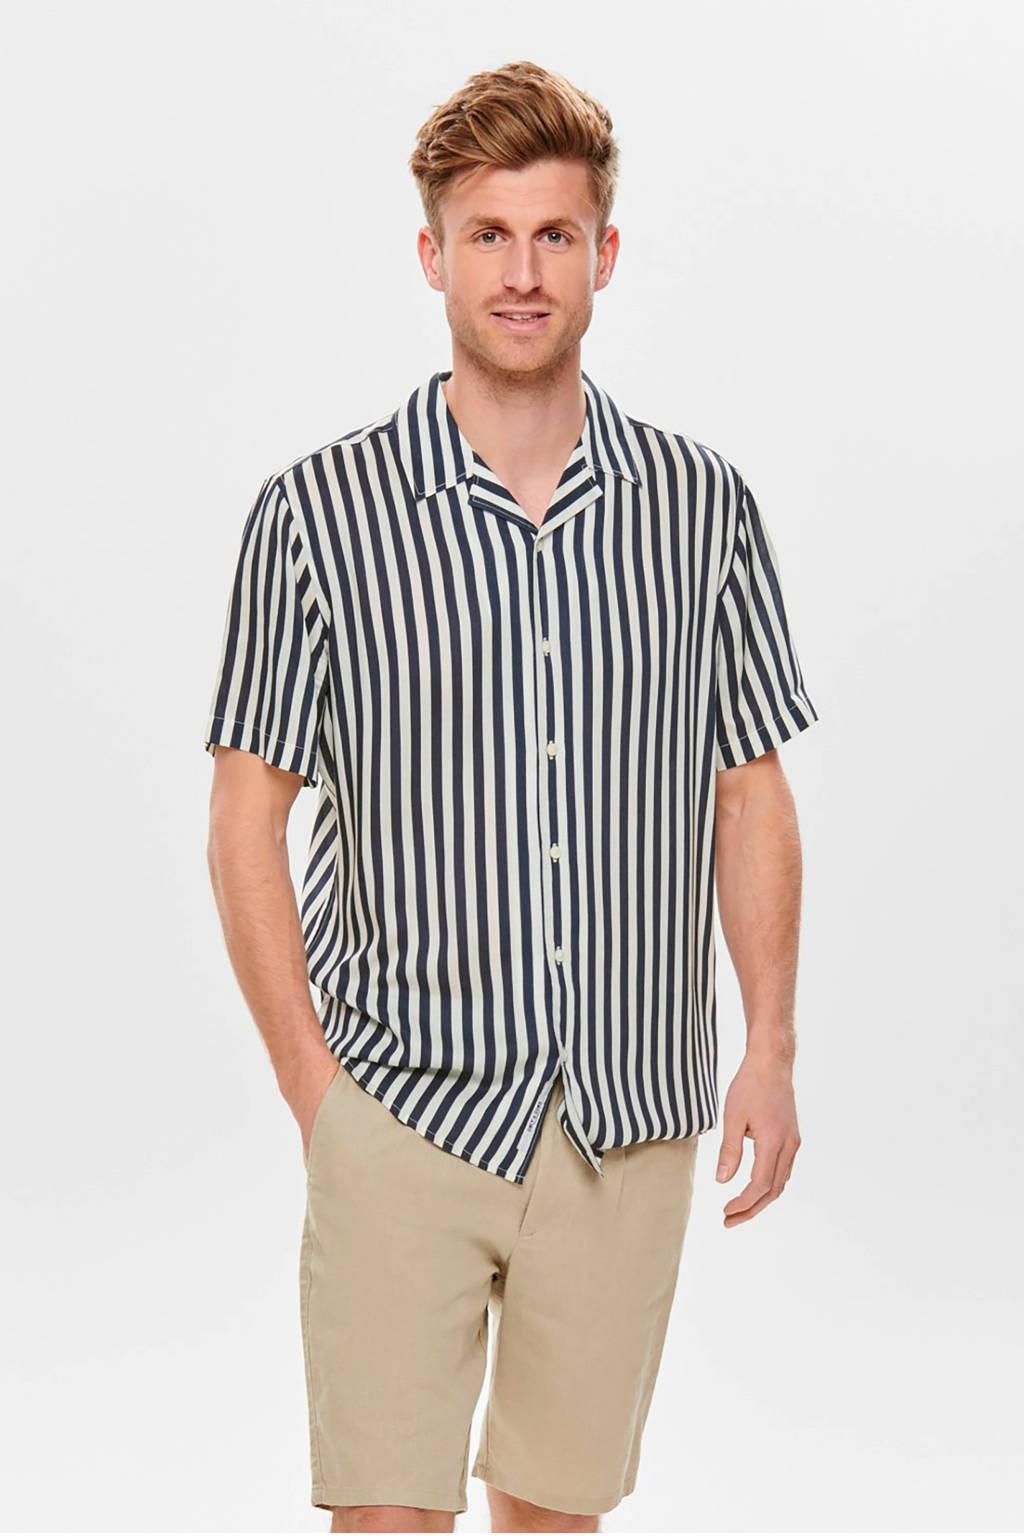 ONLY & SONS gestreept regular fit overhemd blauw, Blauw/wit